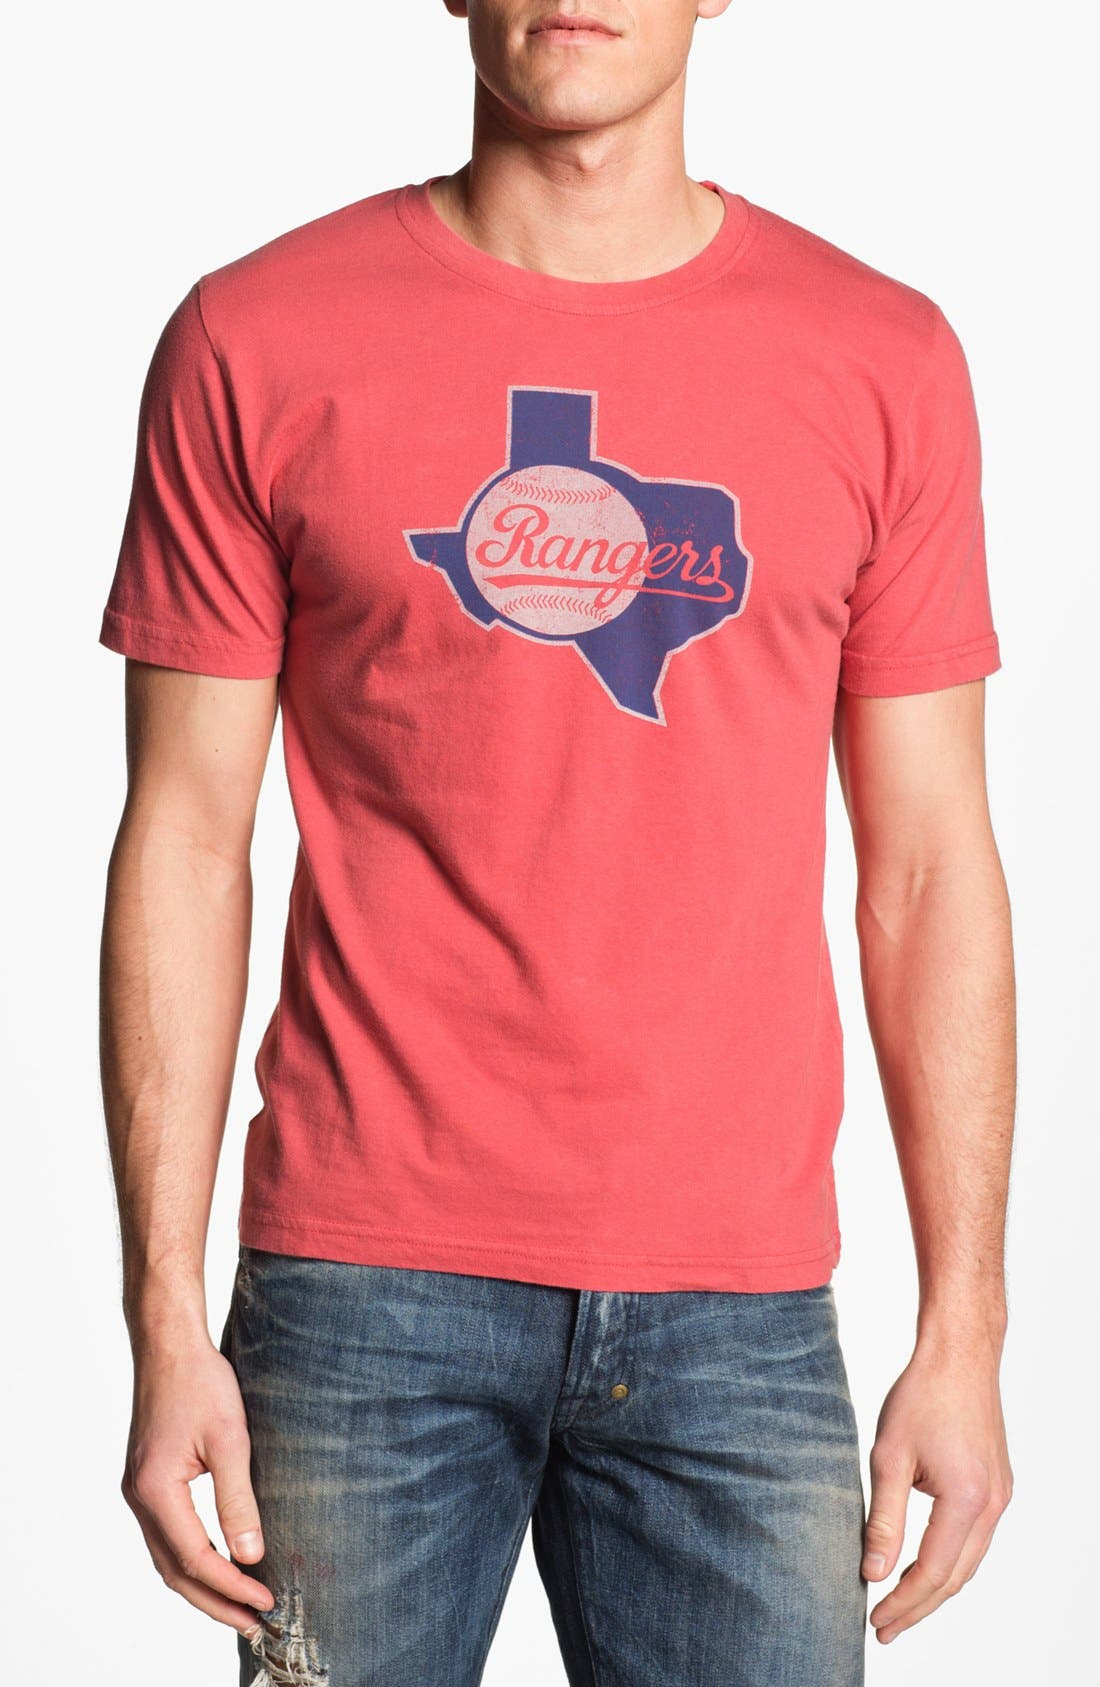 Red Jacket 'Texas Rangers' T-Shirt (Men)